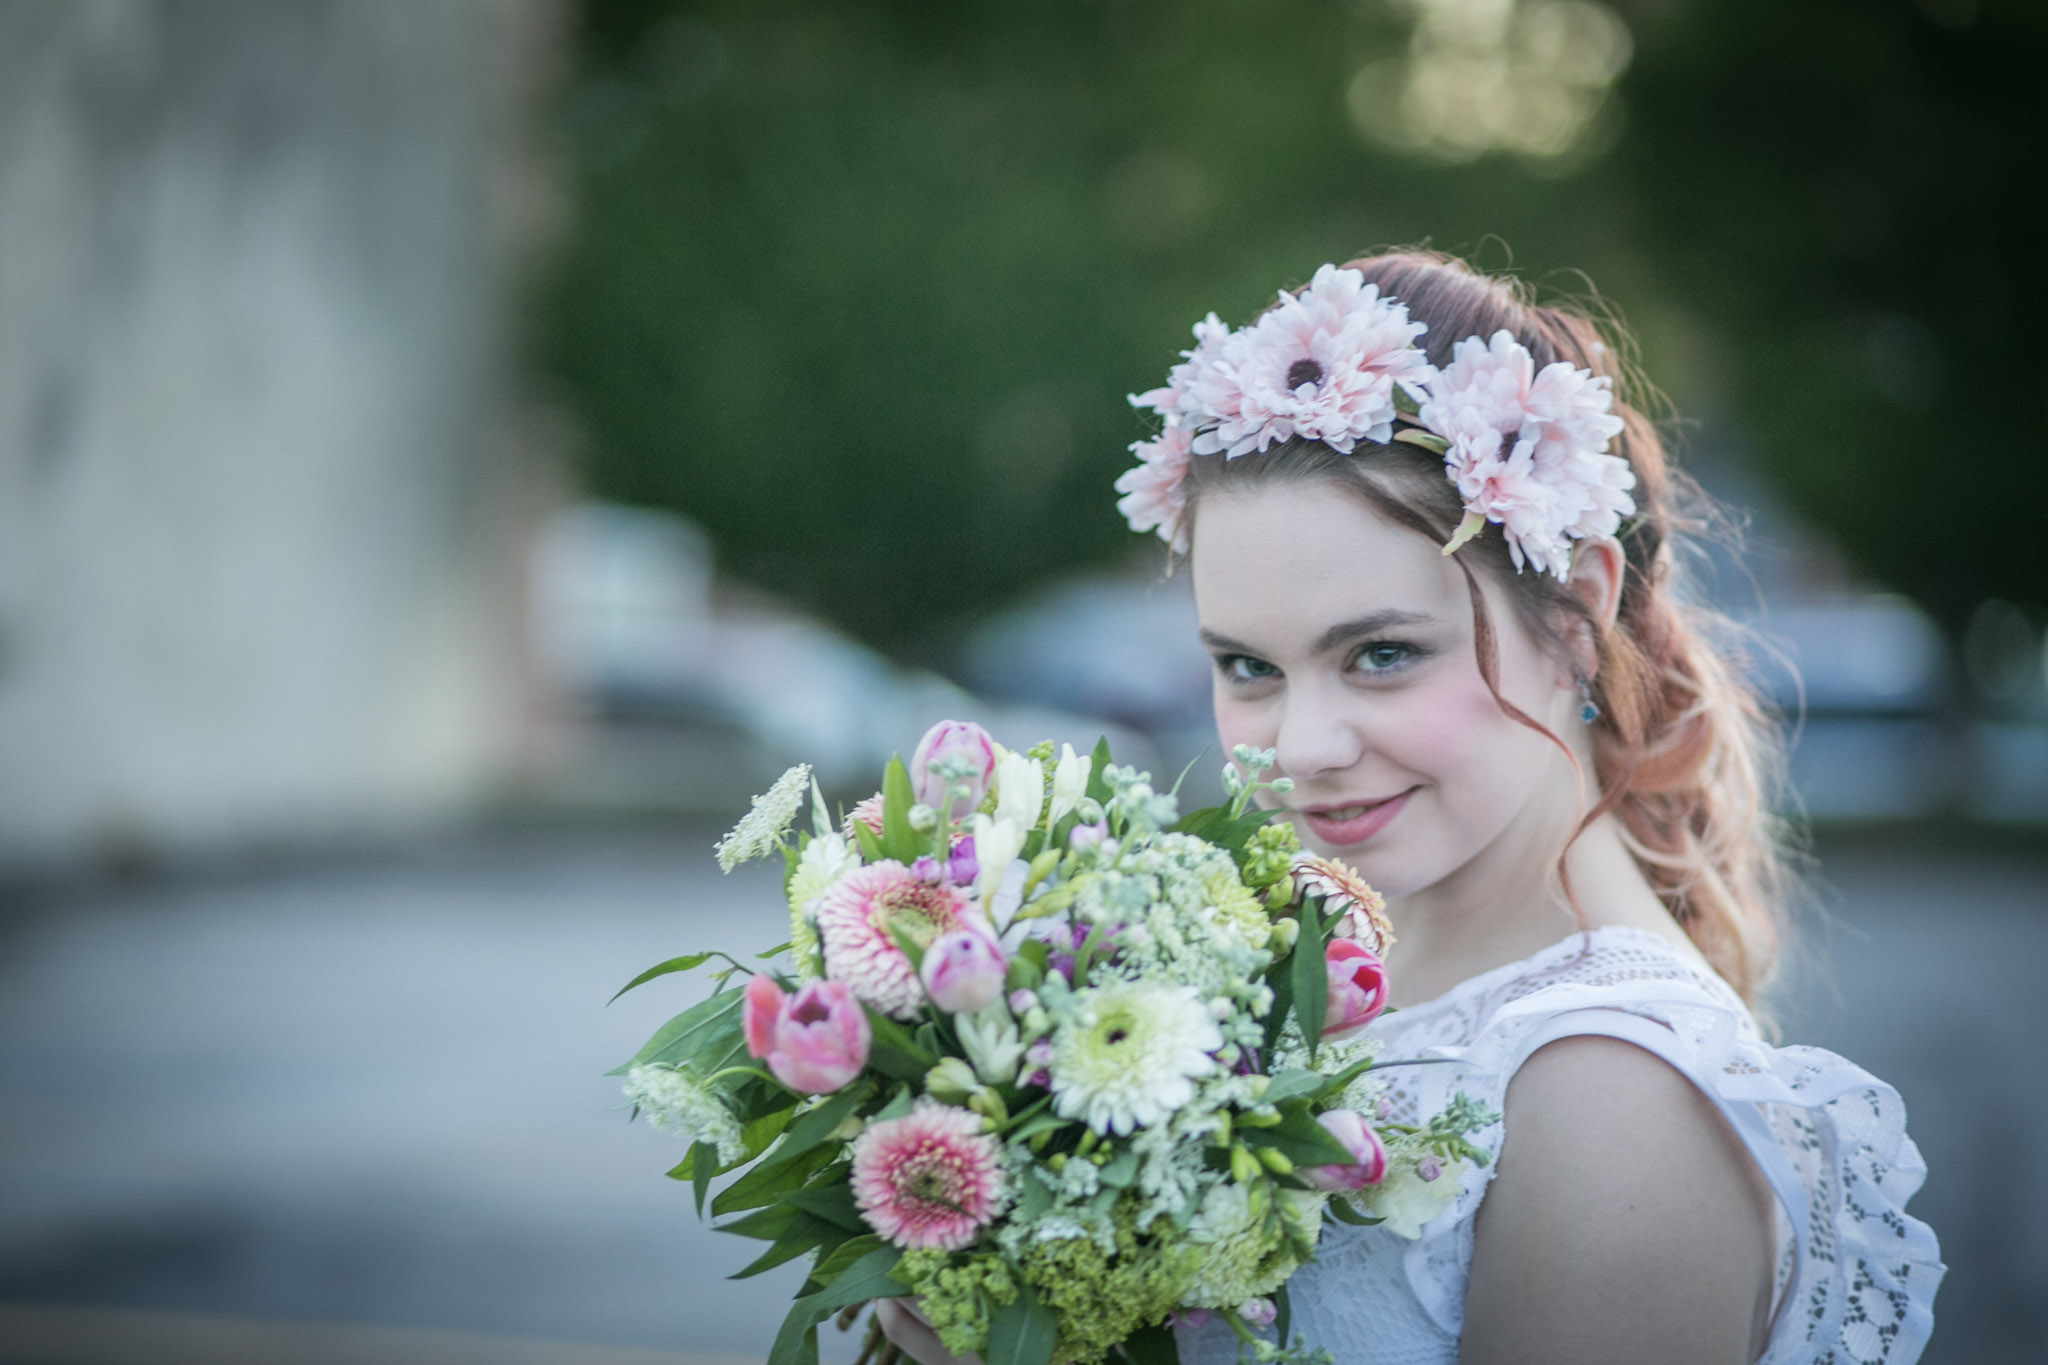 Kansas_City_Small_Wedding_Venue_Elope_Intimate_Ceremony_Budget_Affordable_Sophie&Philip_271.jpg